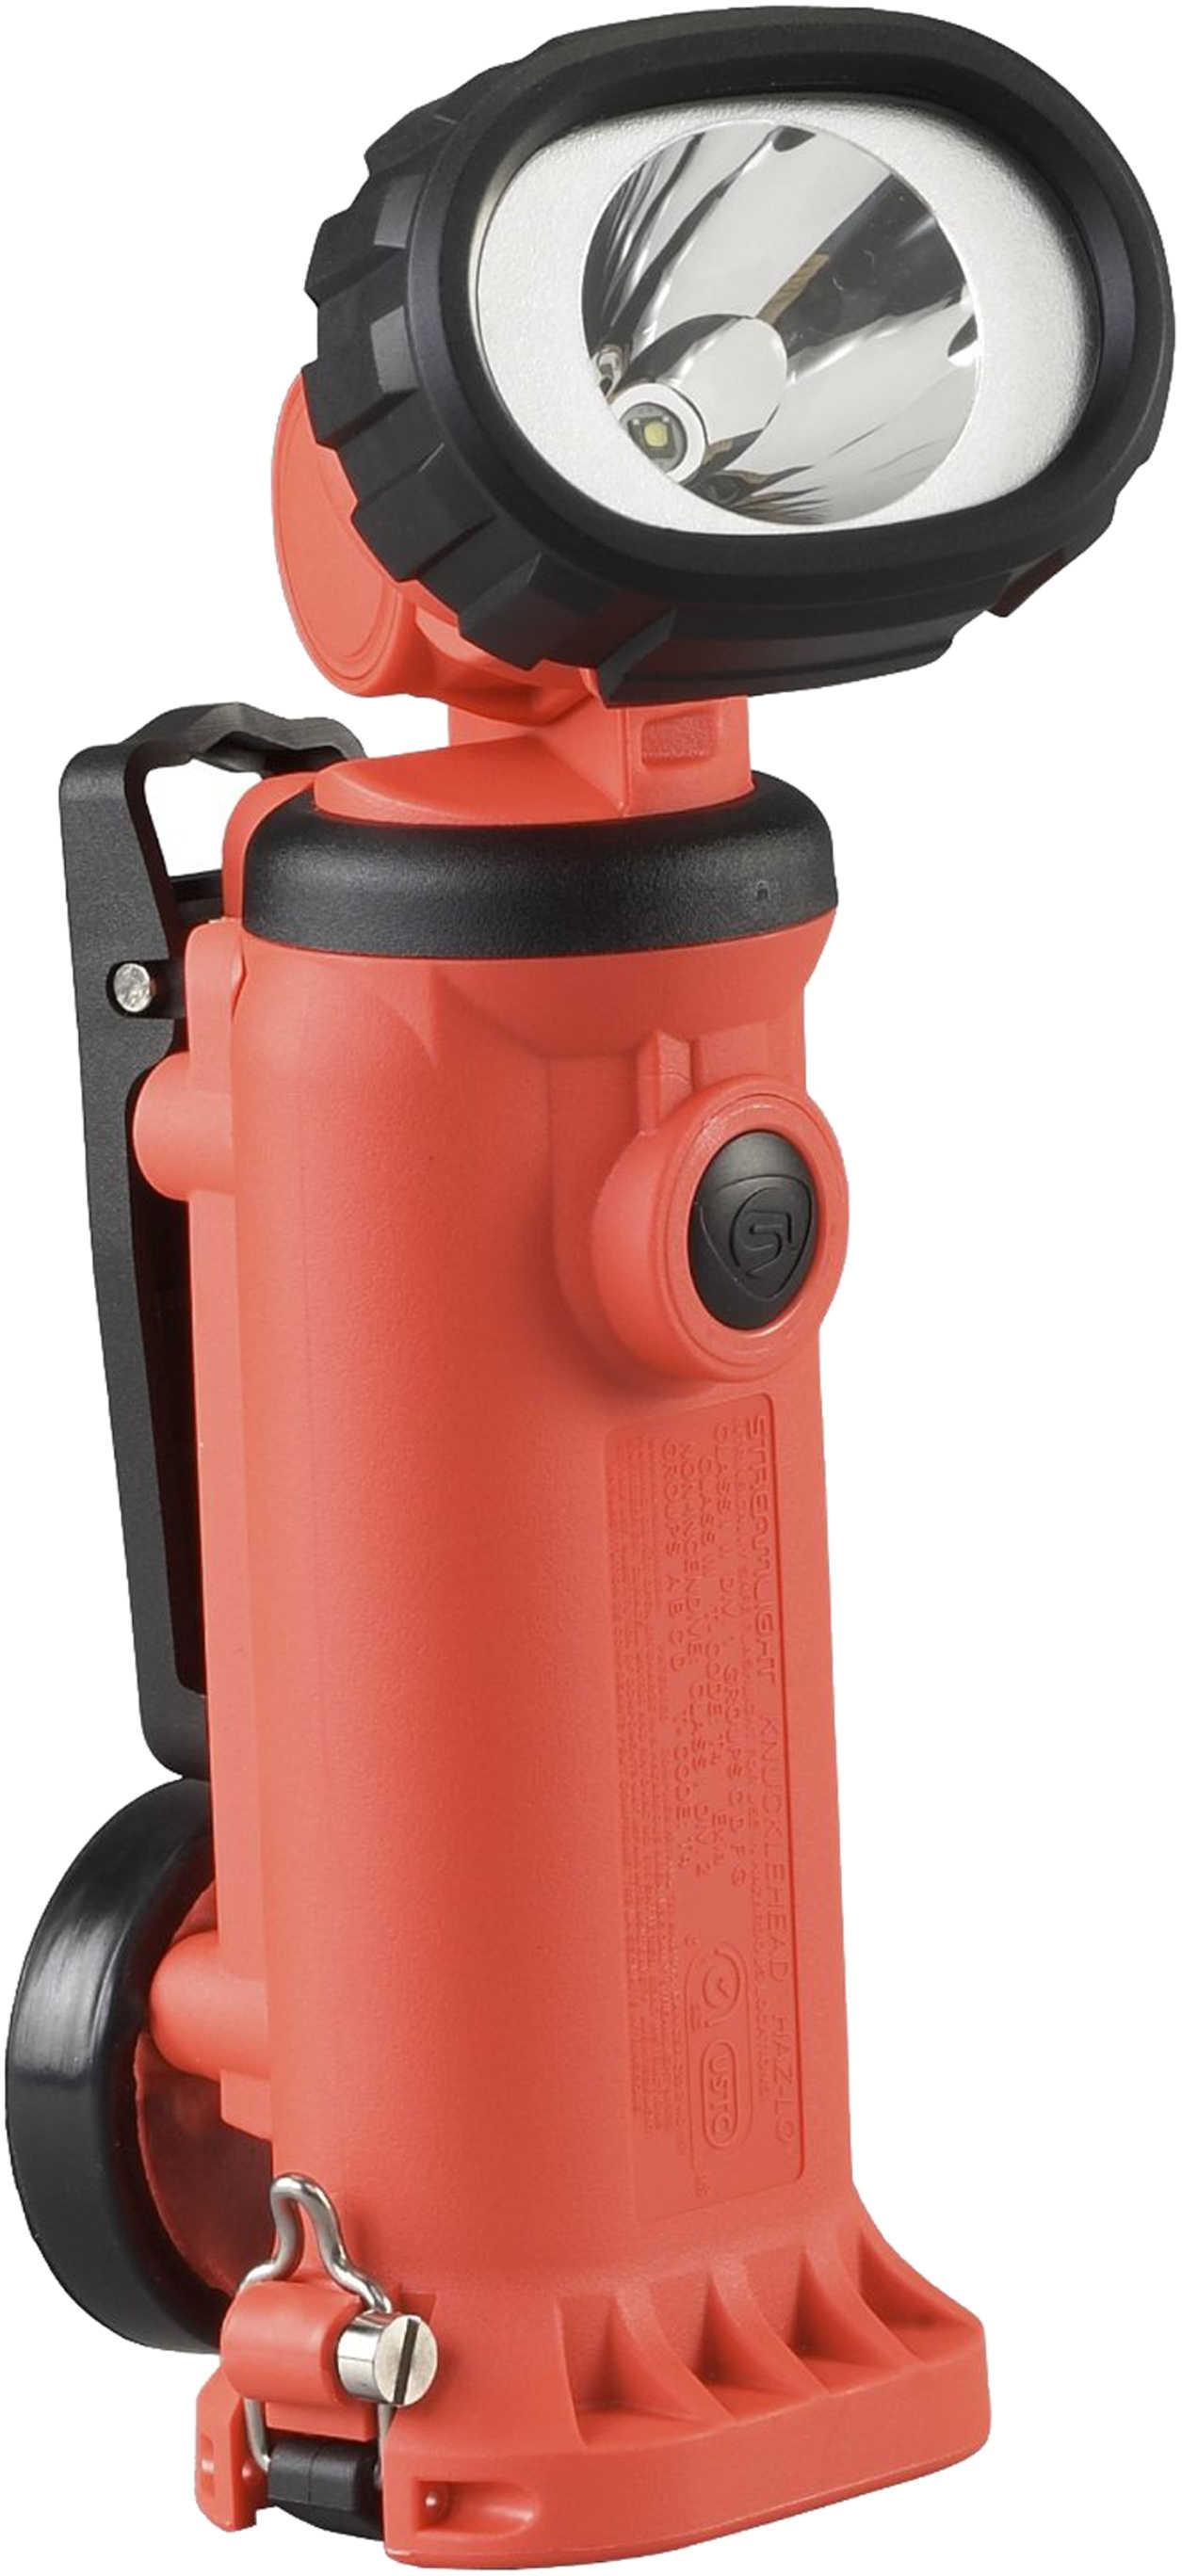 Streamlight Knucklehead HAZ-LO Light Spot w/o Charger, Orange 91751